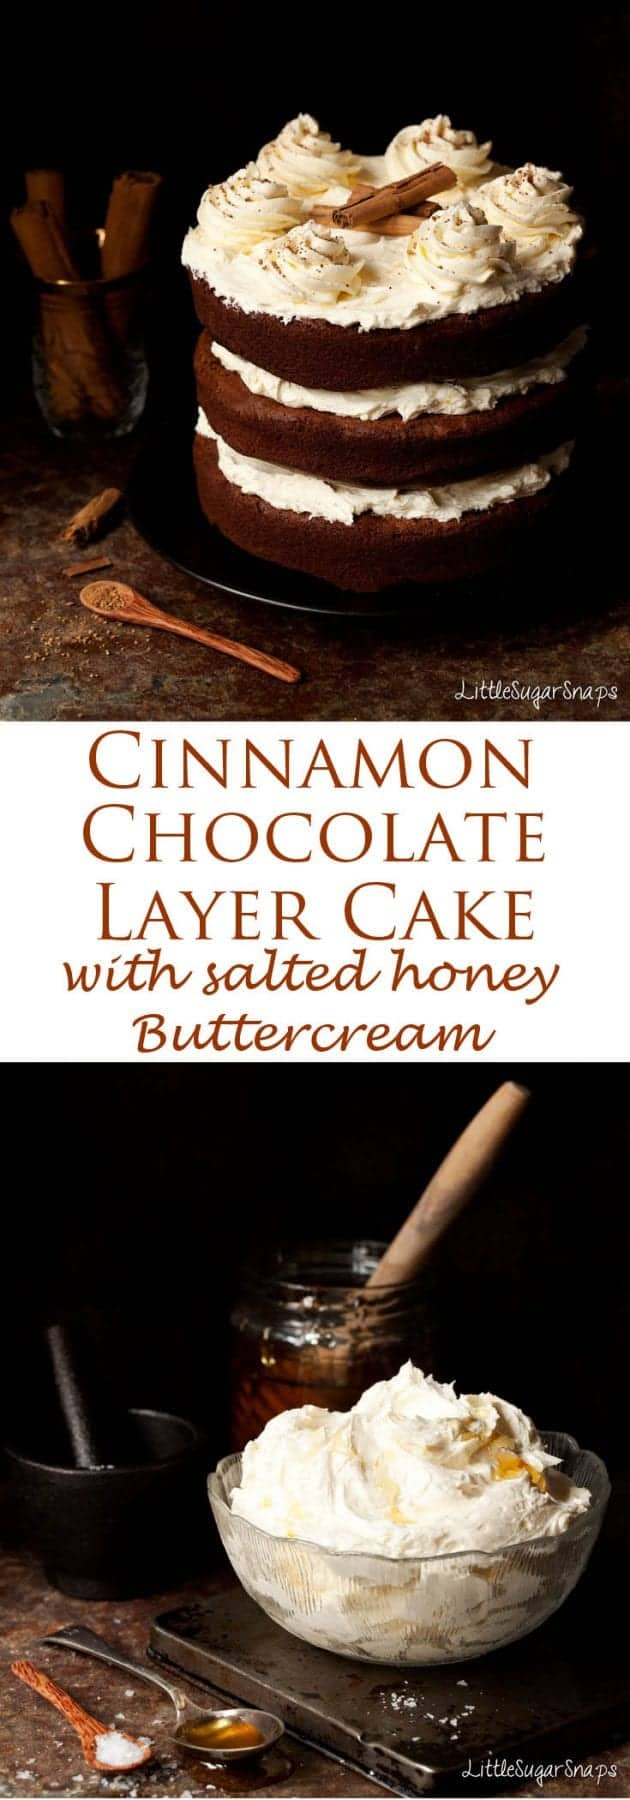 Using Leftover Spice Cake